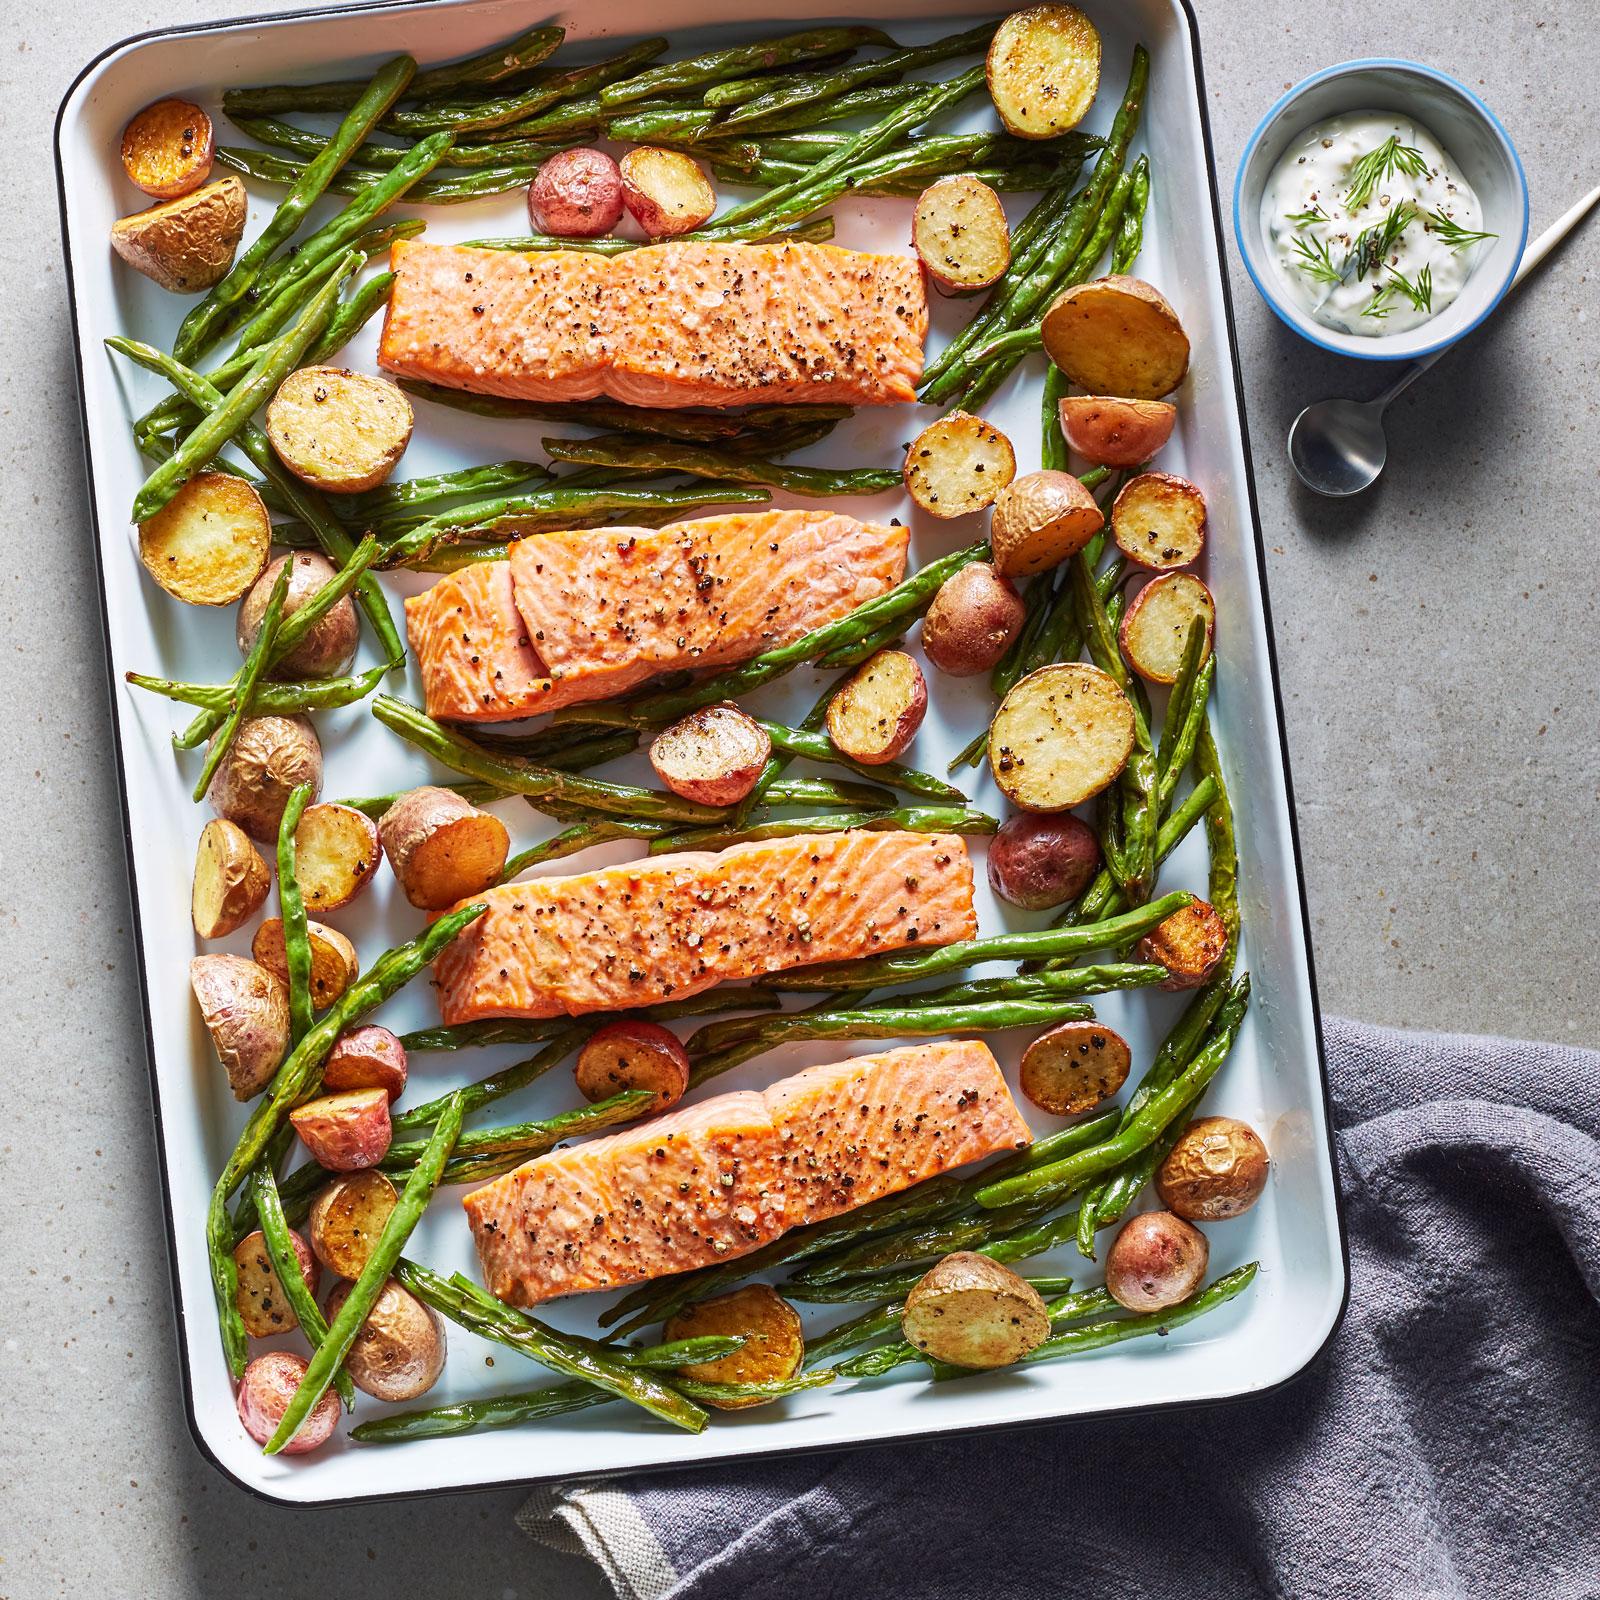 Sheet Pan Salmon, Green Beans, and Potatoes image